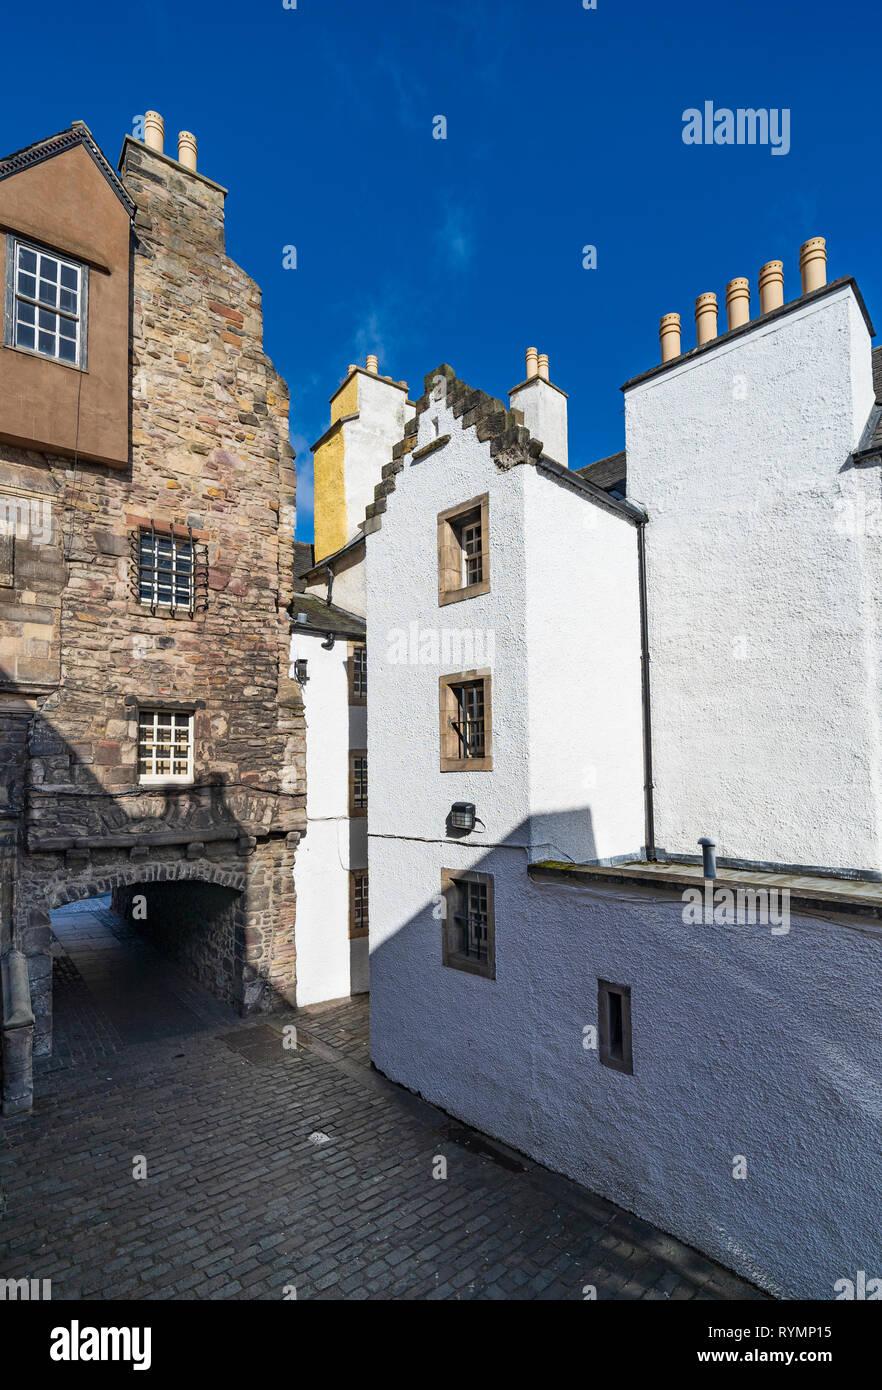 View of Bakehouse Close on Royal Mile in Edinburgh, Scotland UK. Location of Outlander as fictional Carfax Close. Scotland ,UK - Stock Image